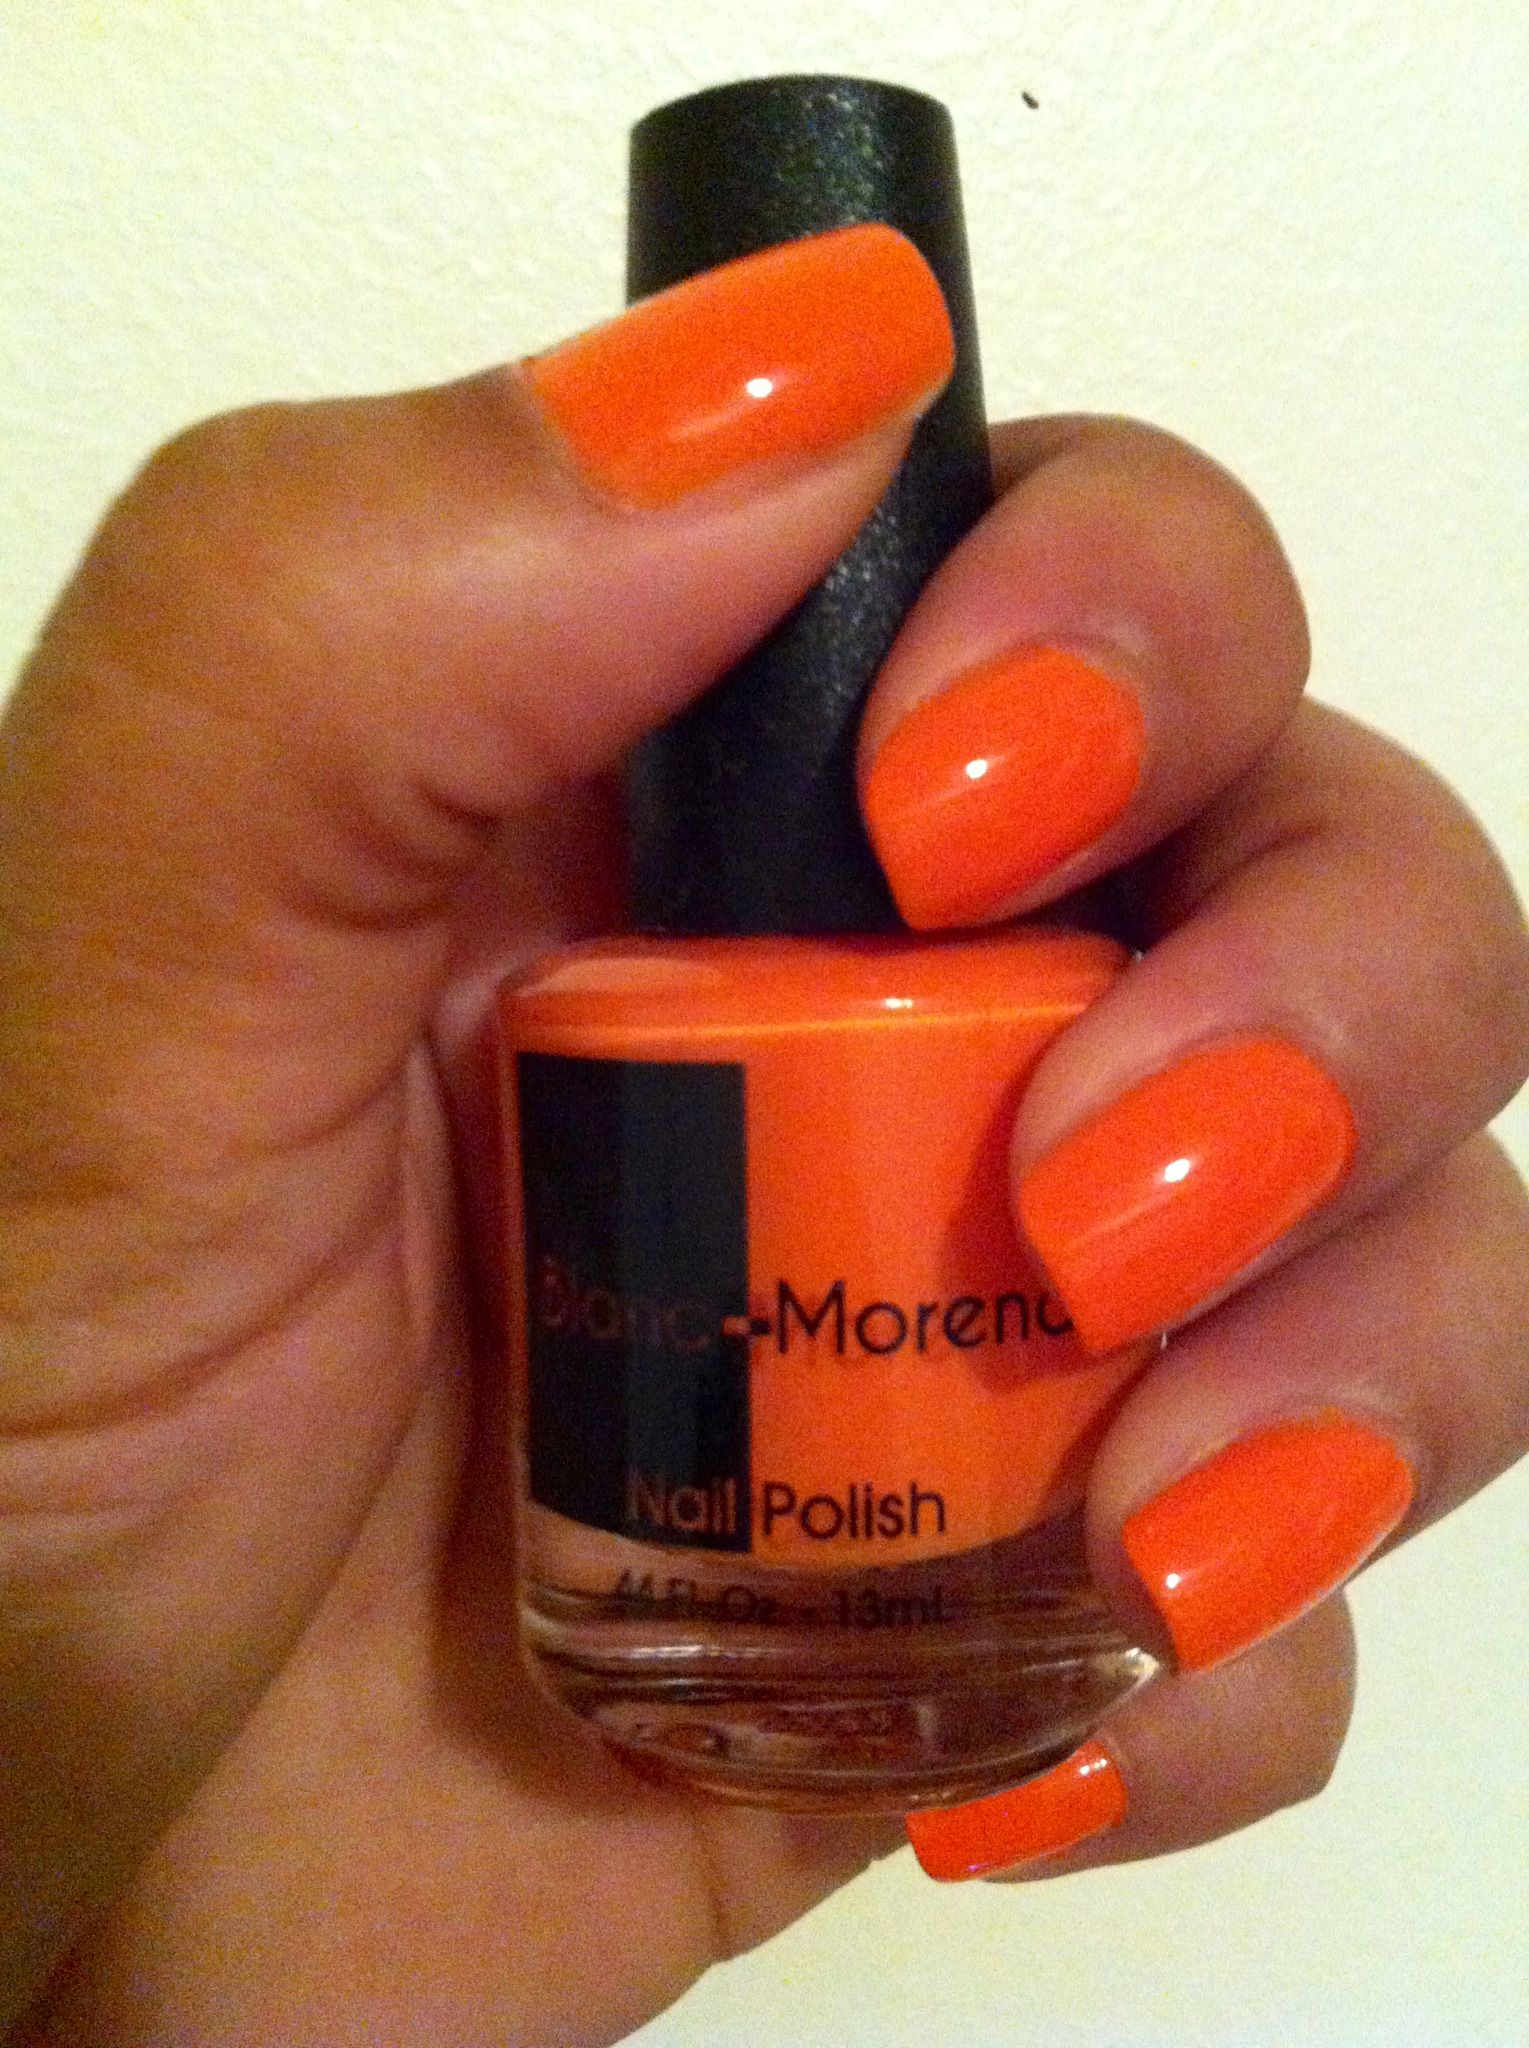 Nails in I AM Awesome! #trendynails #orangenails #4free #nailpolish ...